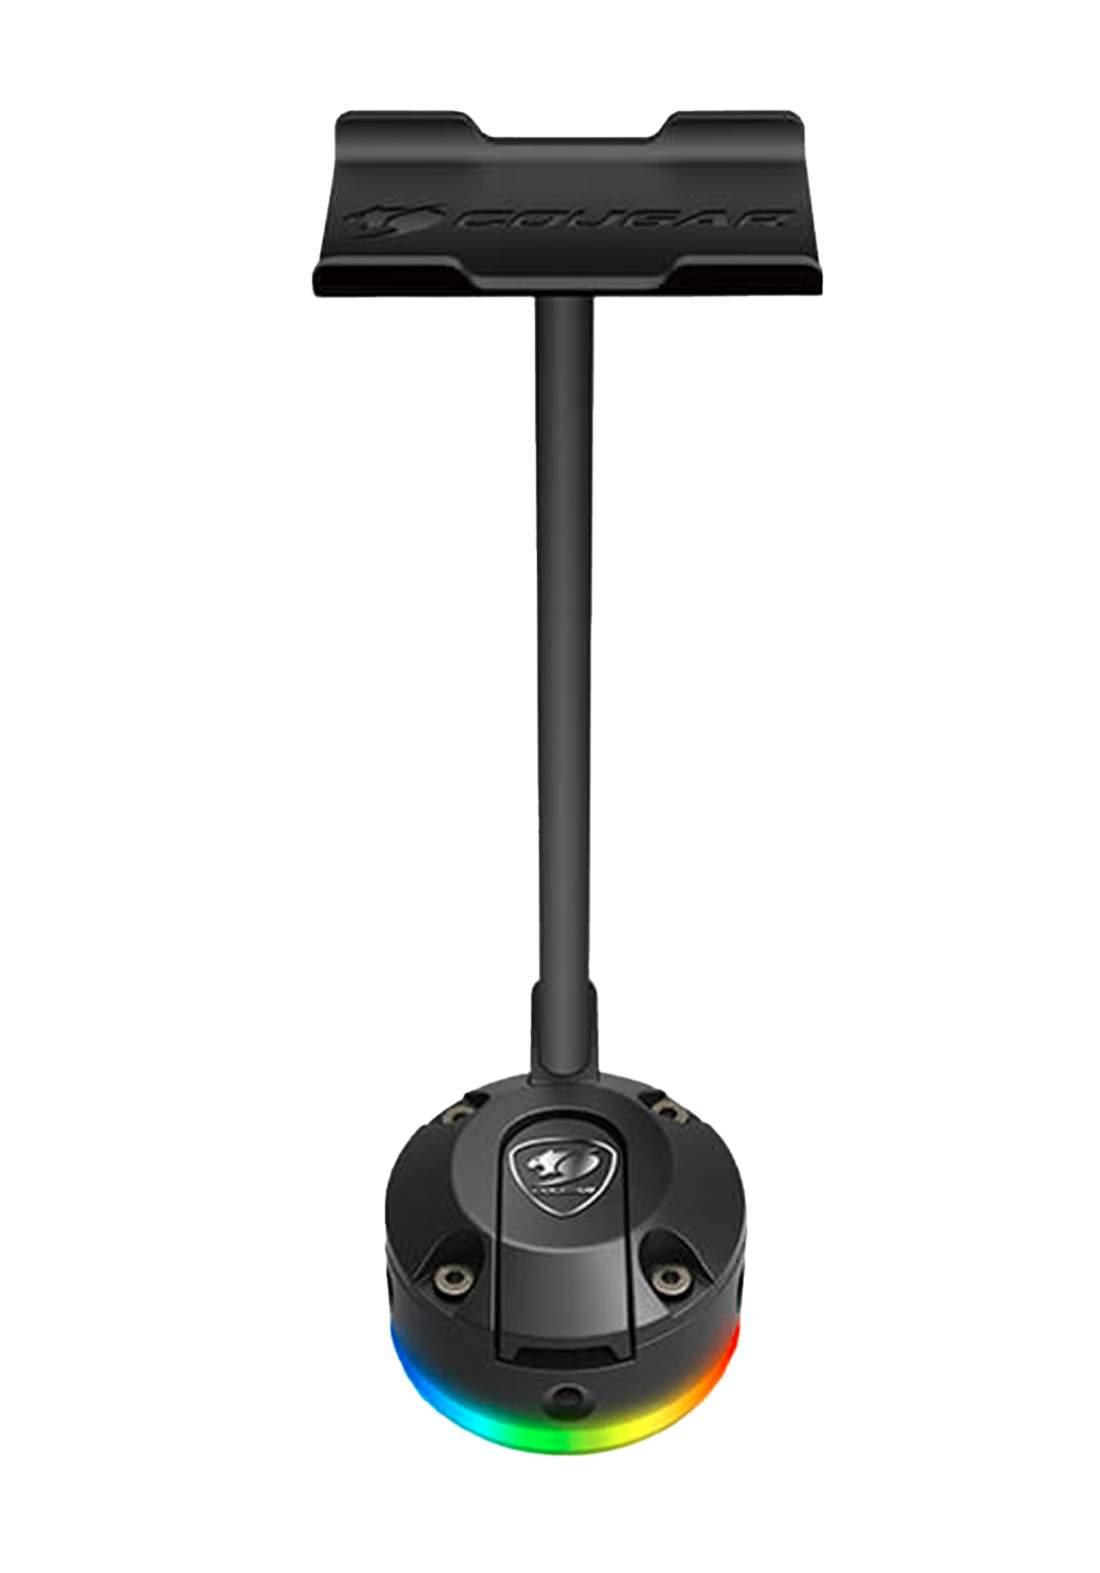 Cougar Bunker S RGB Headset Stand - Black حامل سماعة